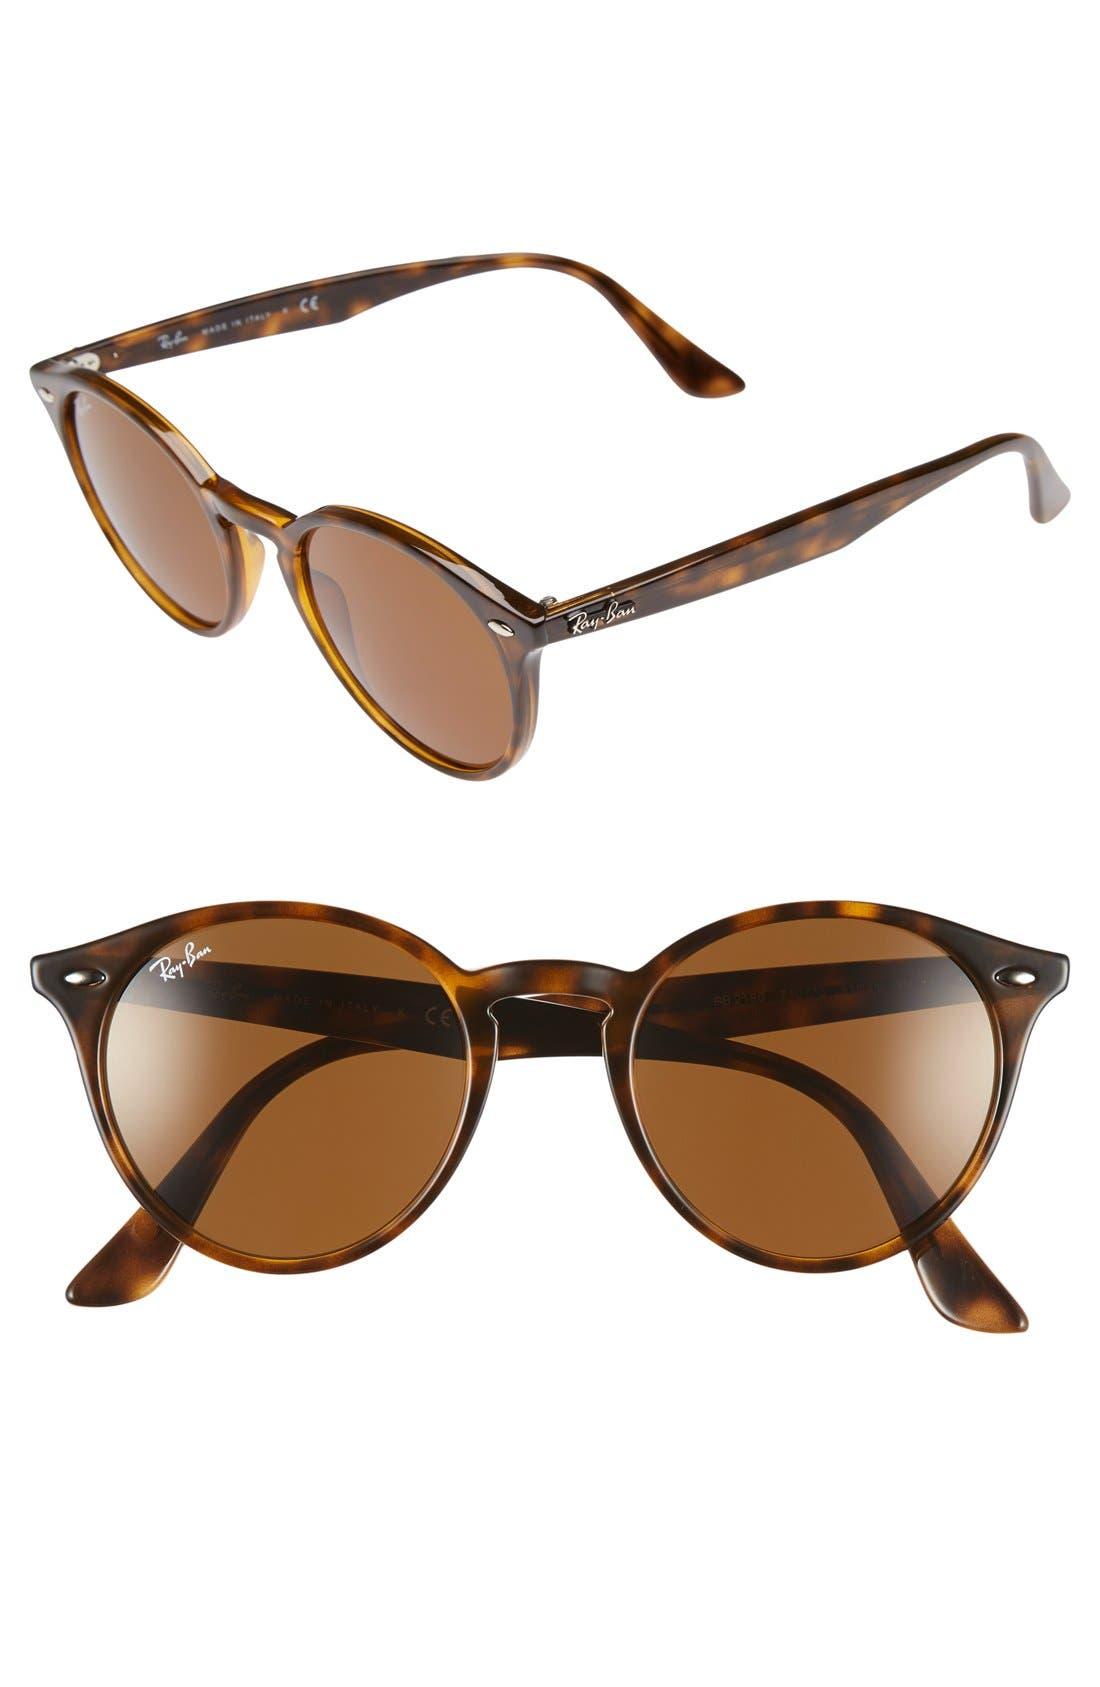 ad7ef6fd4b4d5 ... low price rb1091 cats 5000 black cheap sunglasses ray ban highstreet  round sunglasses b3b25 c5972